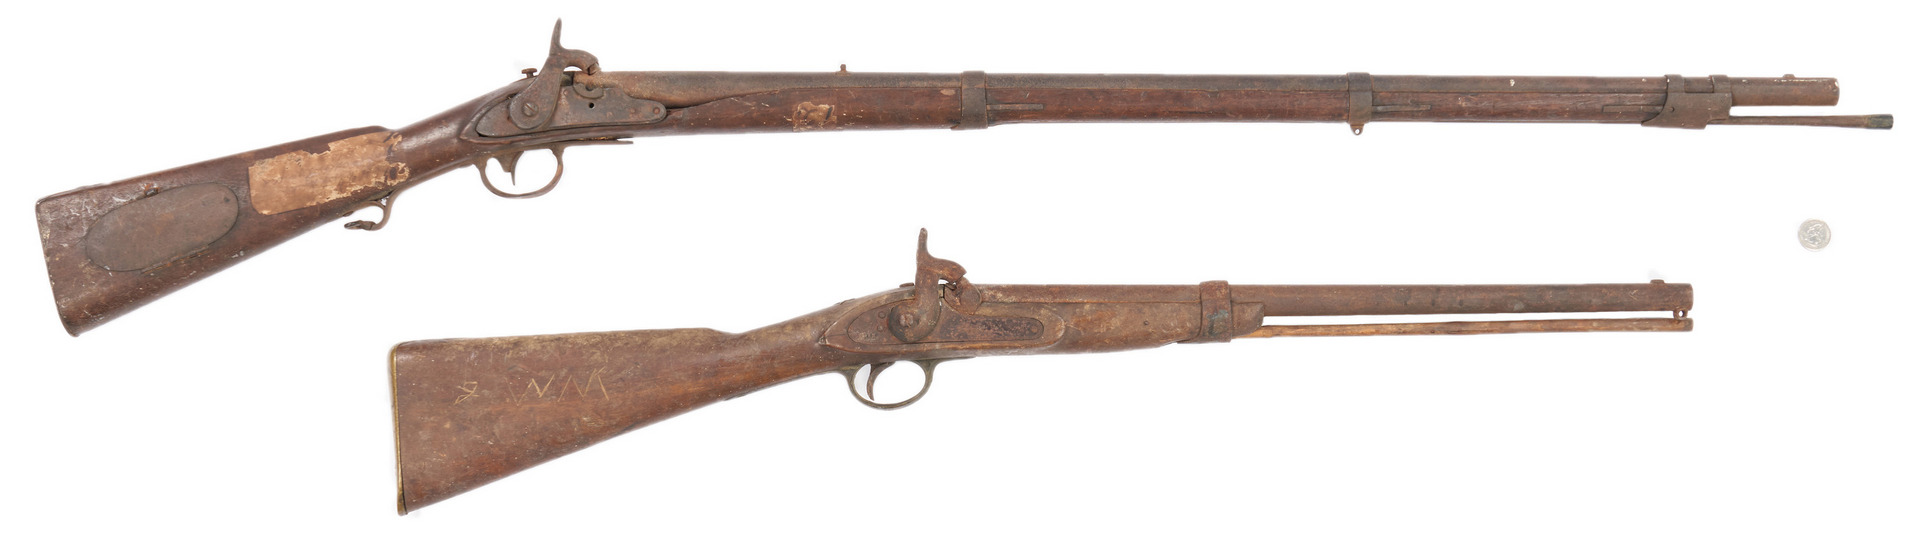 Lot 706: 2 Civil War Era Guns, poss. TN Battlefield Pickups